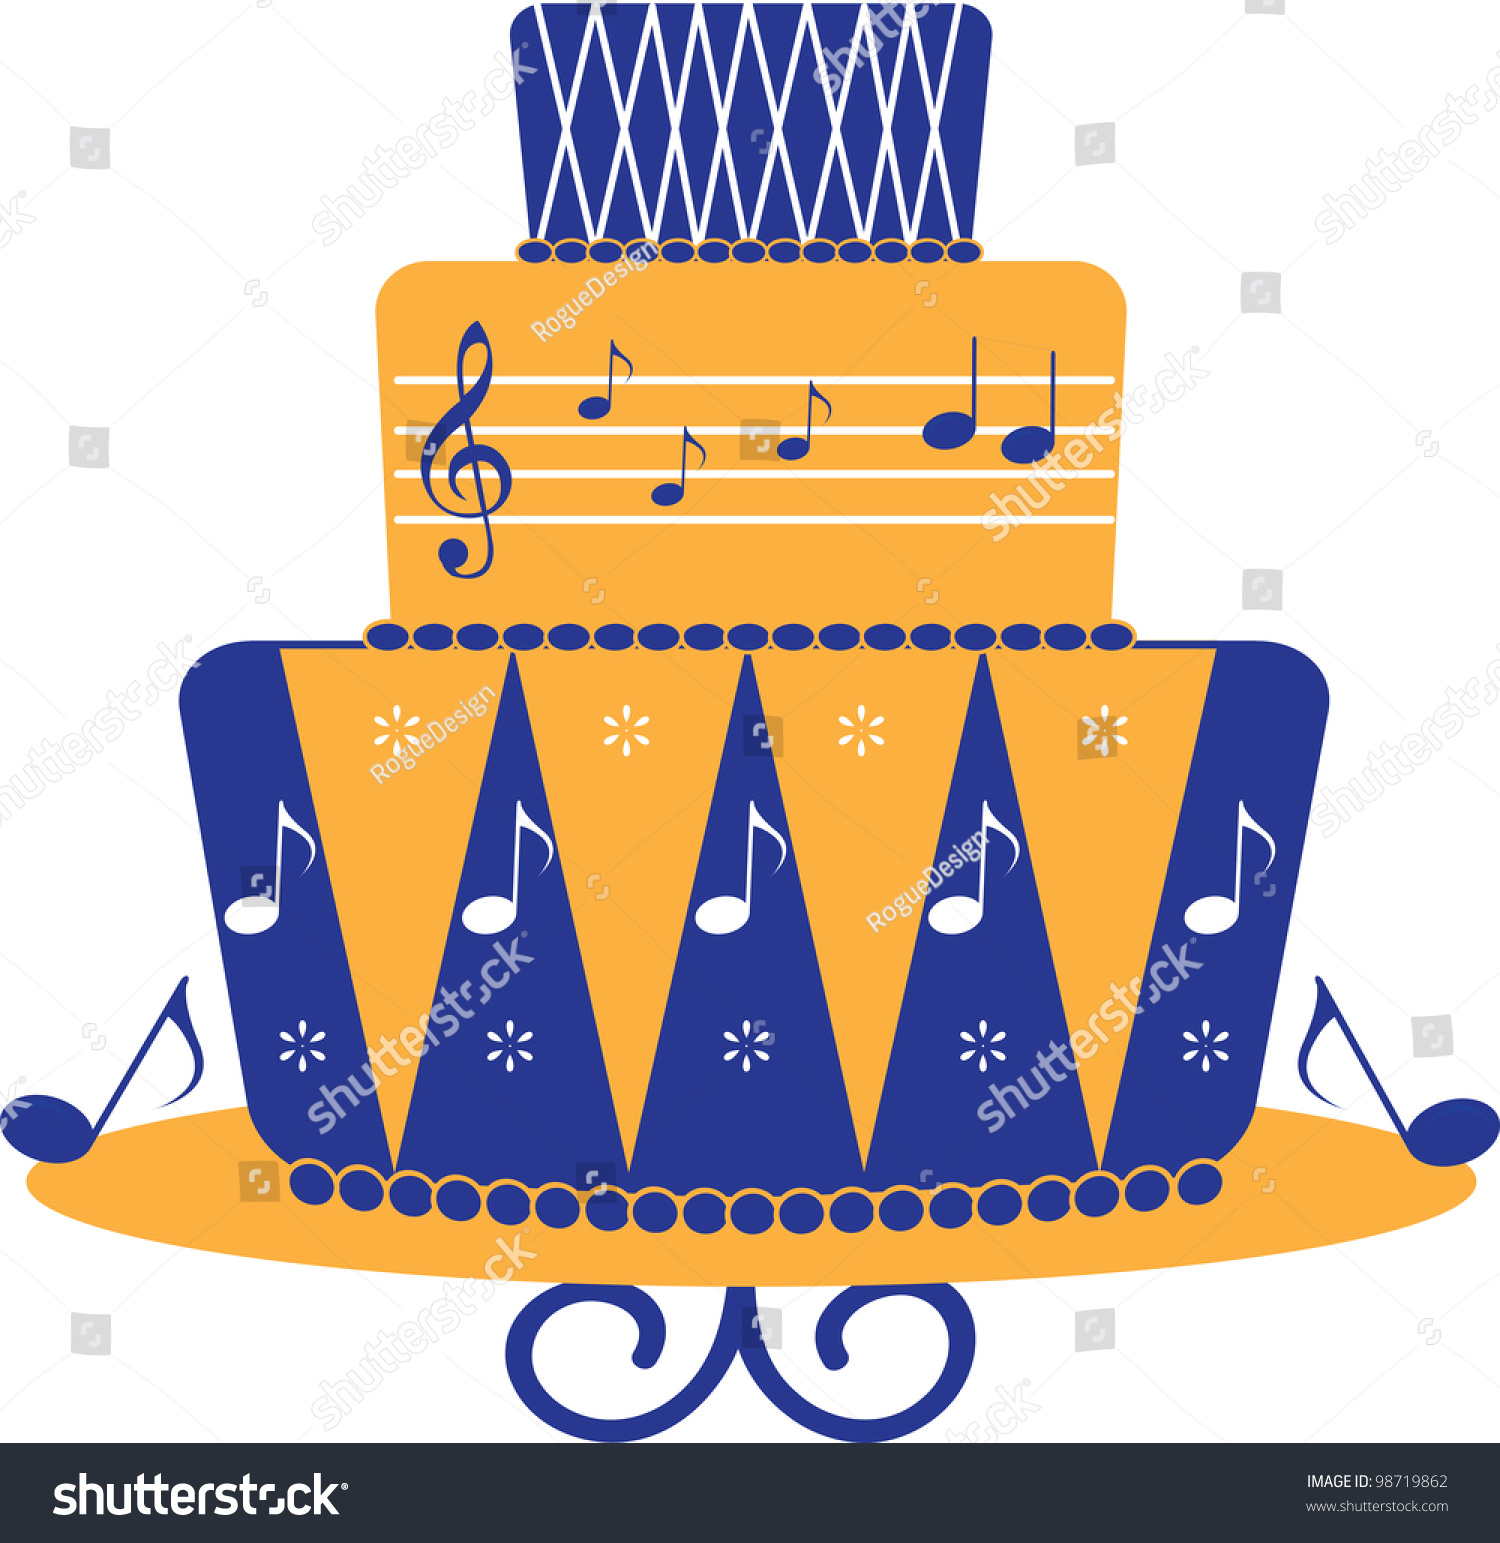 Topsy Turvy Cake Clipart : Clip Art Illustration Of Fondant Covered, Modern Style ...